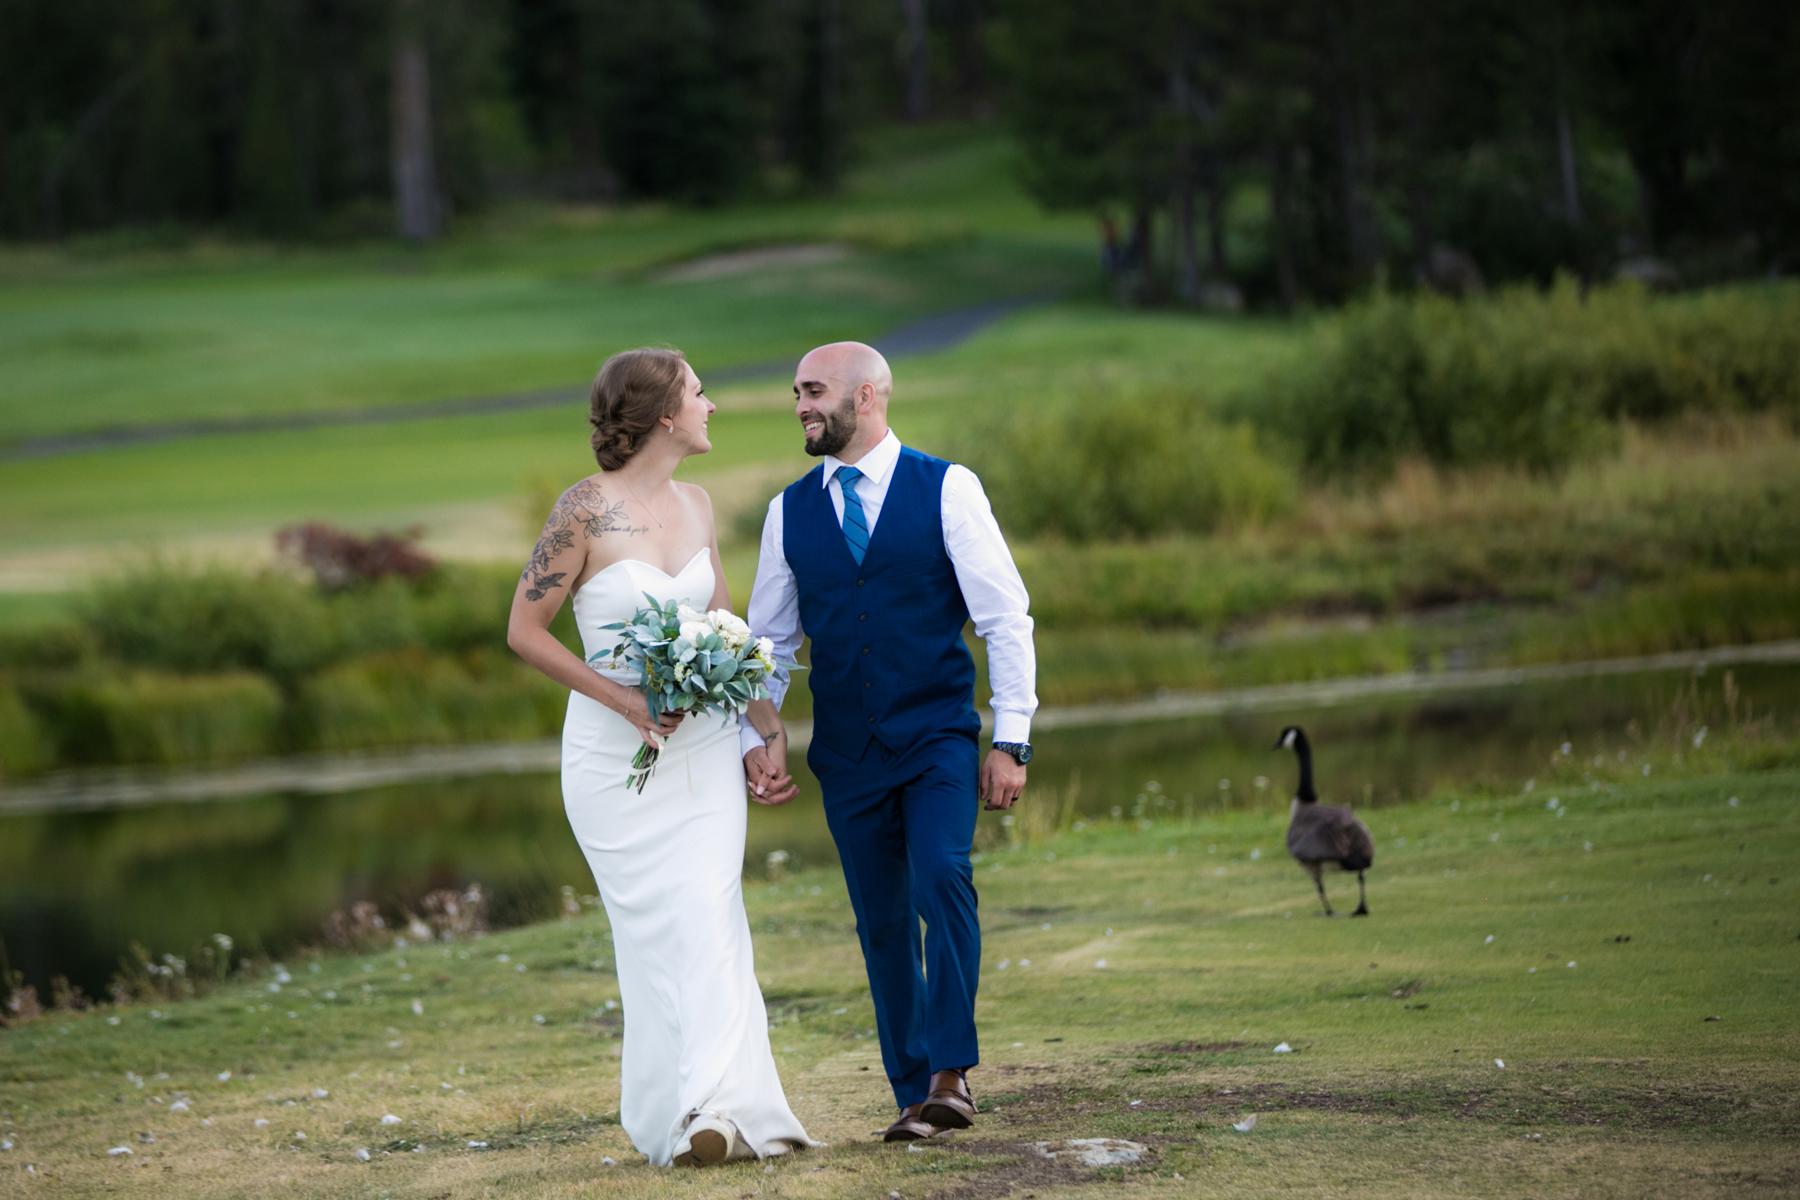 Resort-at-Squaw-Creek-weddings-76